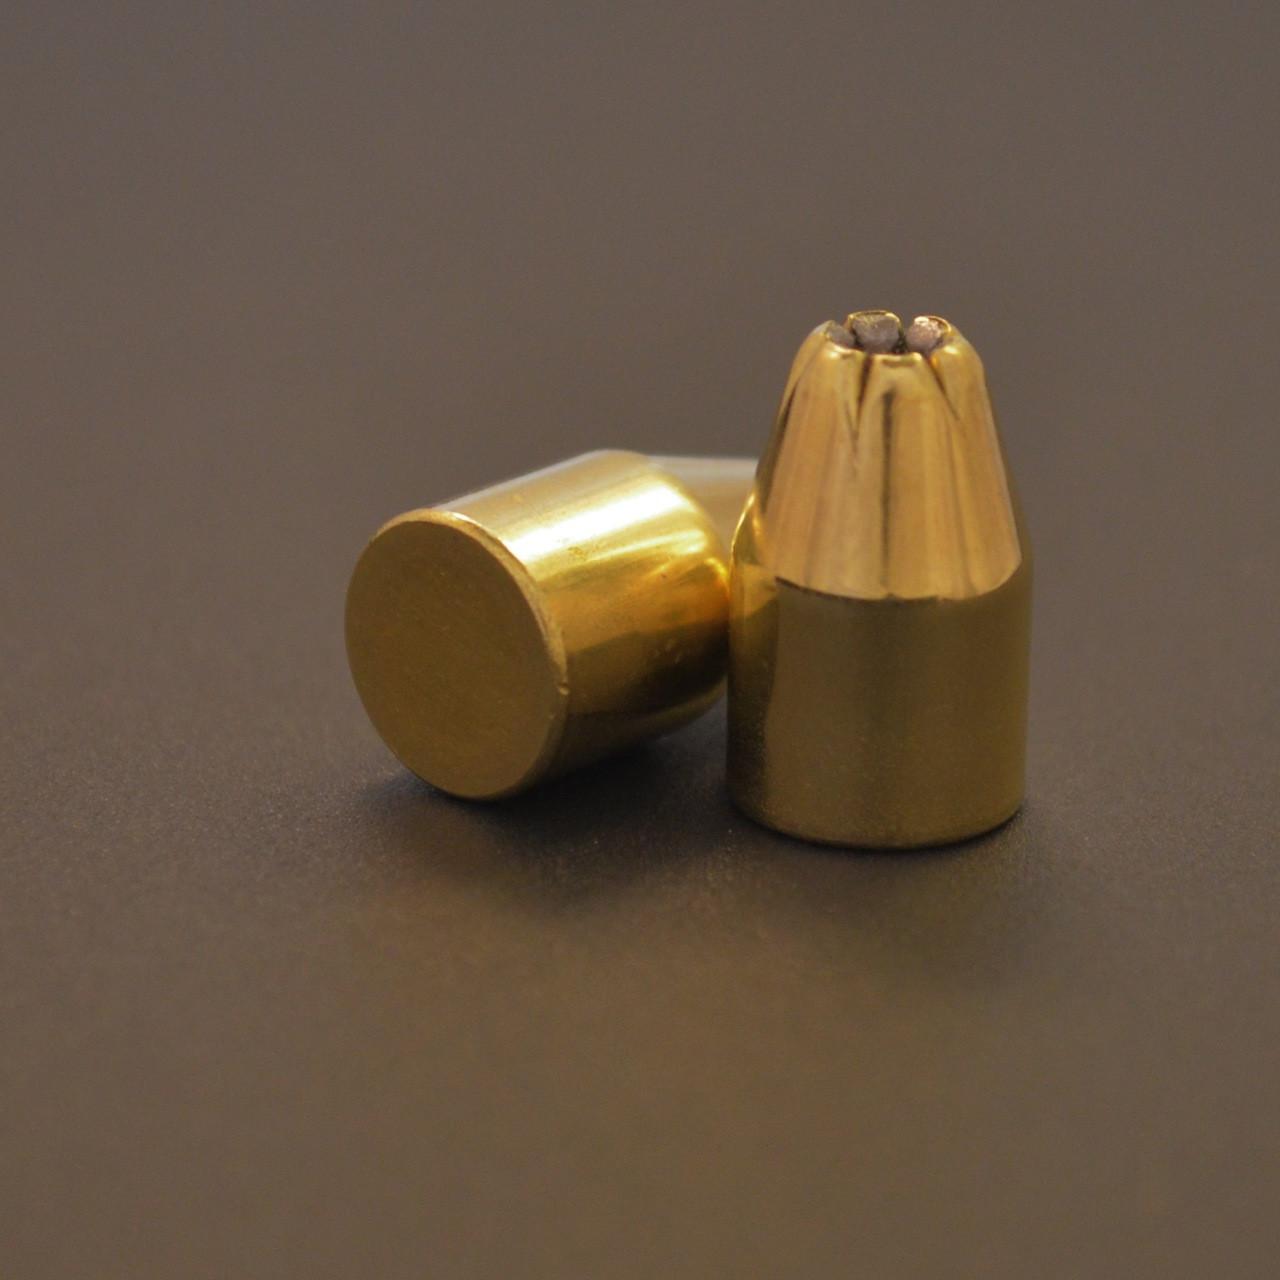 9mm/124gr JHP - 500ct